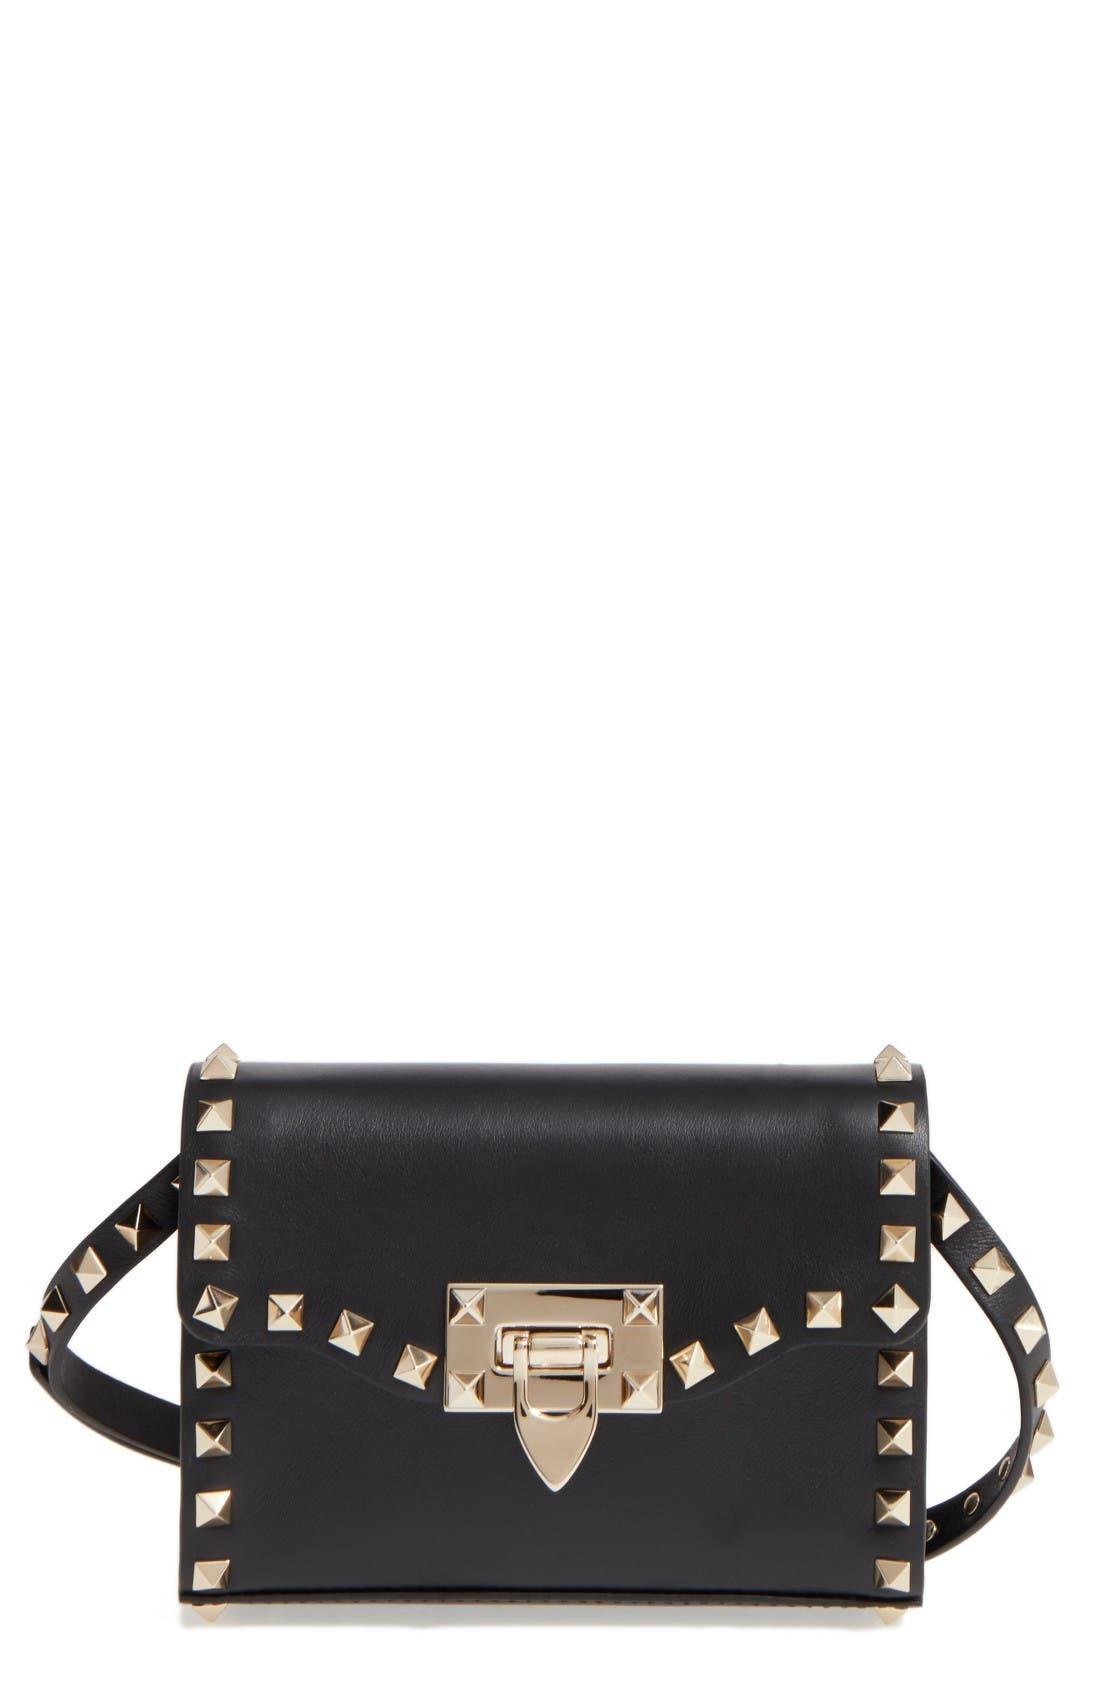 Main Image - Valentino Small Rockstud Leather Shoulder Bag